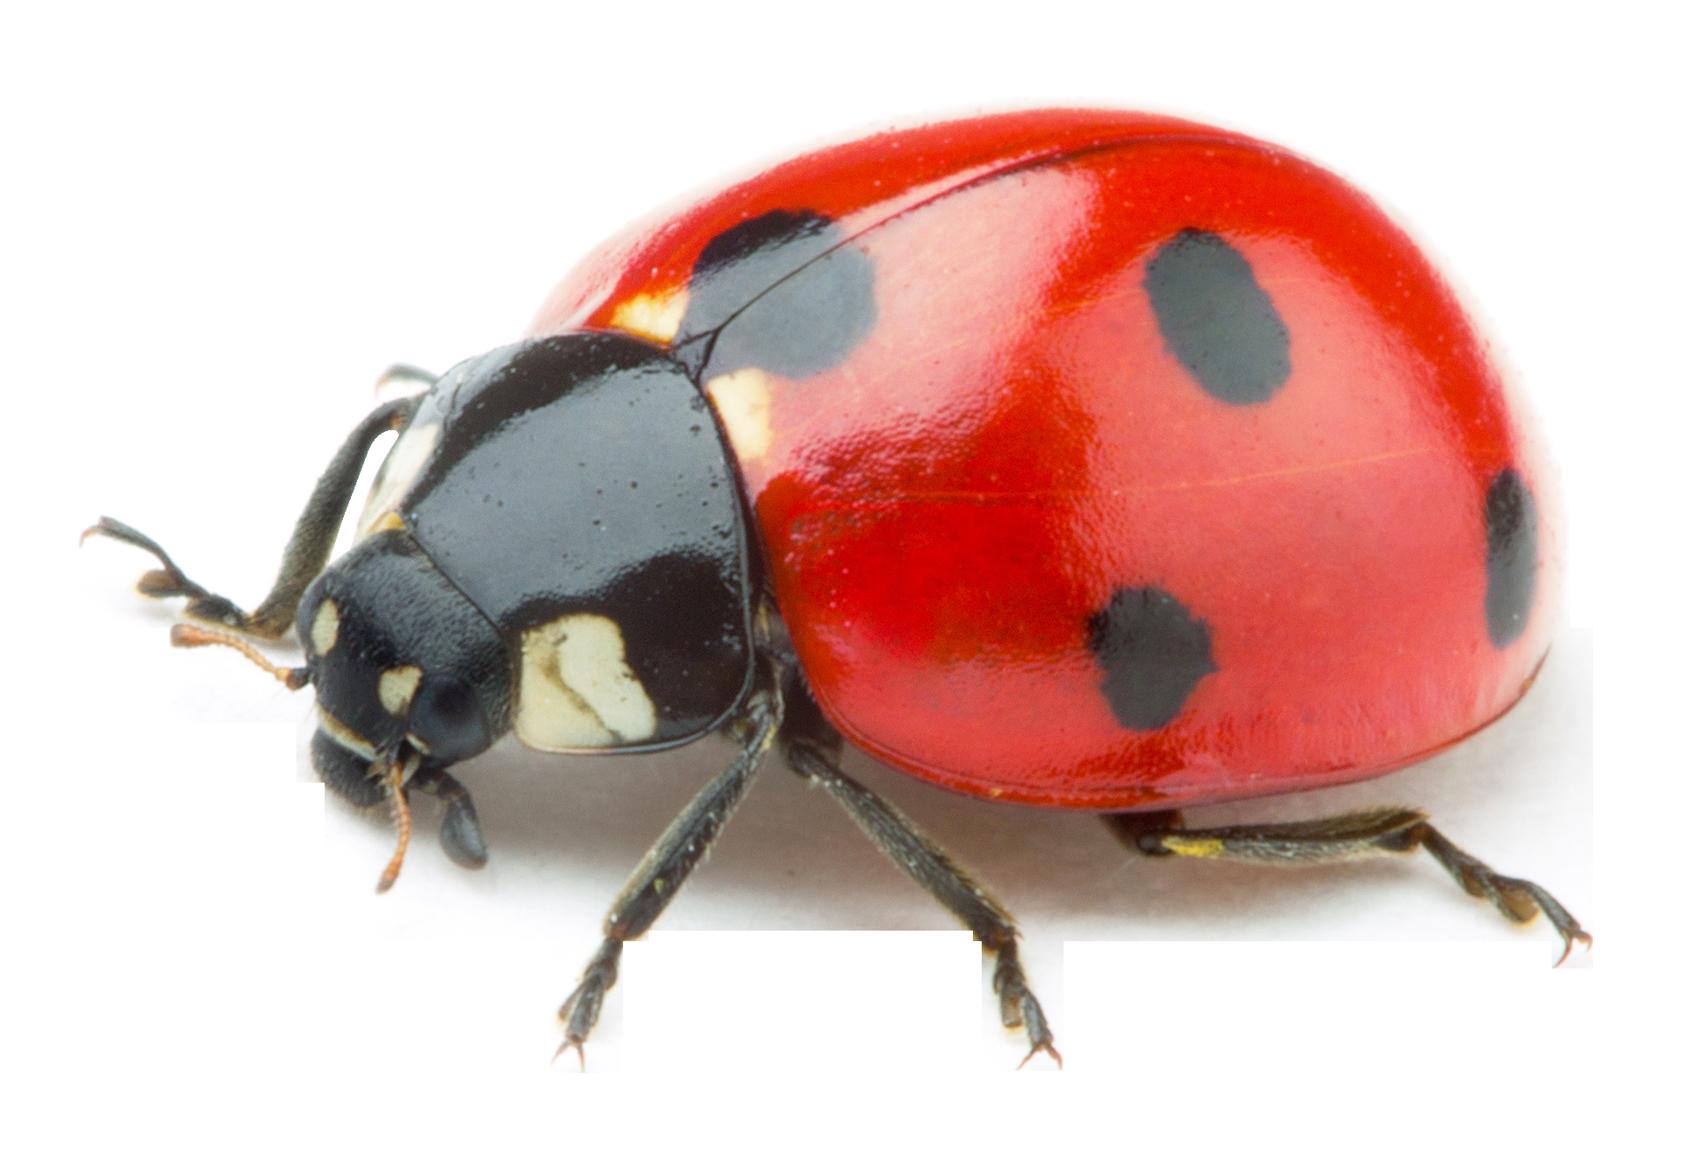 vector free download Ladybug transparent. Image pngpix com png